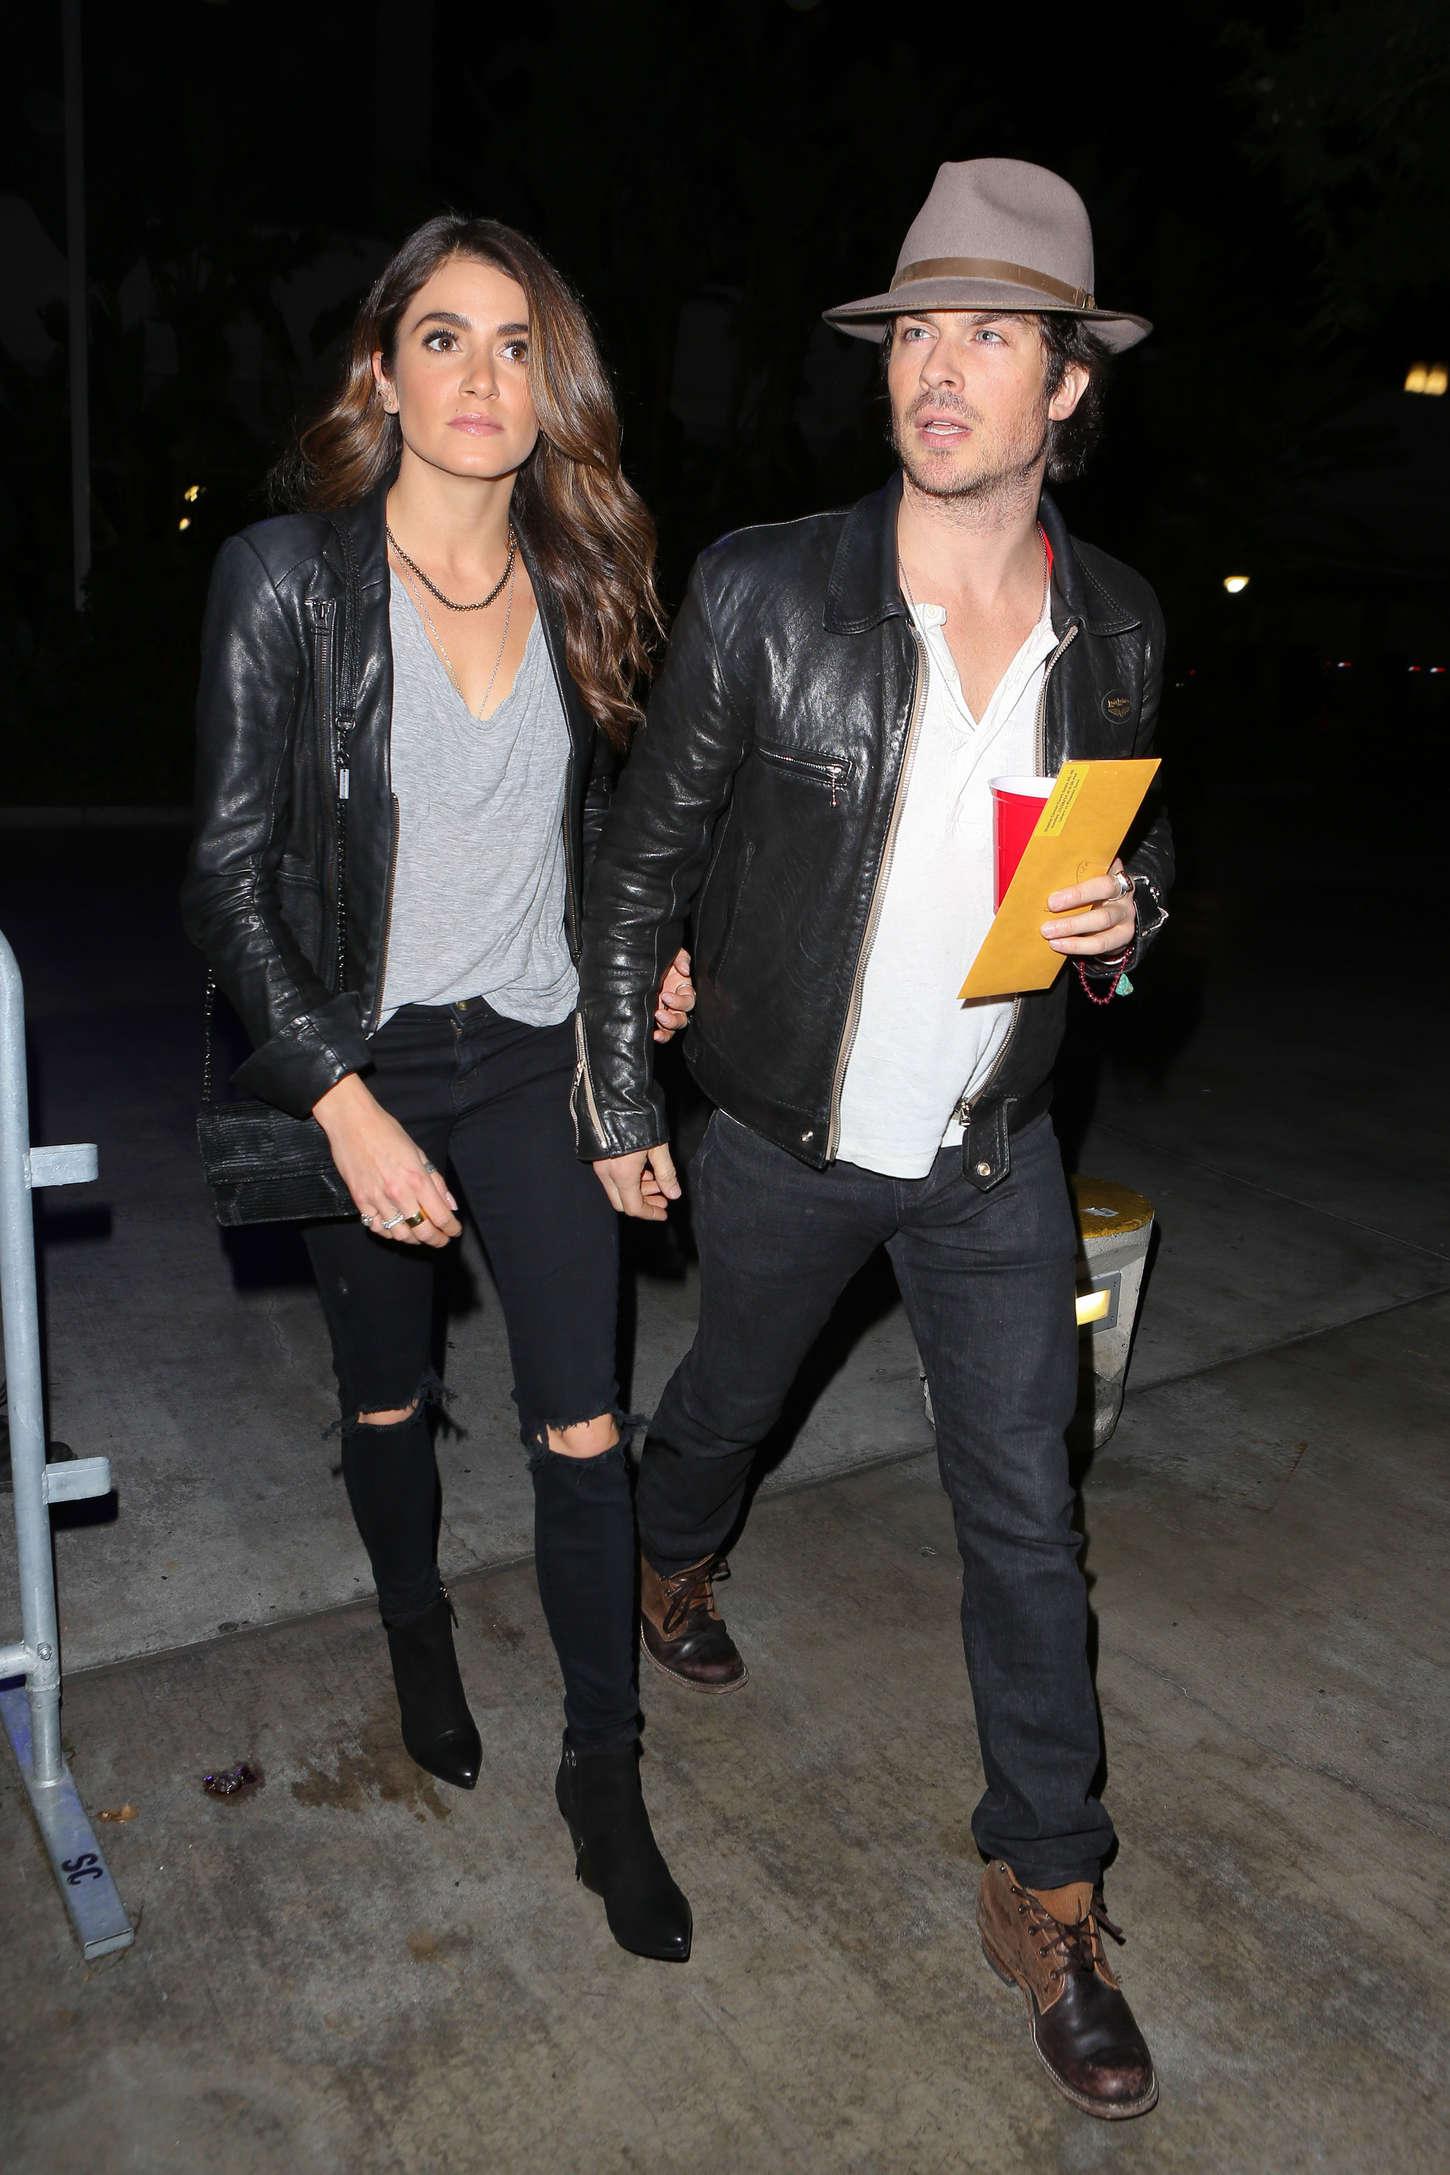 Nikki Reed 2014 : Nikki Reed and Ian Somerhalder at the Staples Center -11